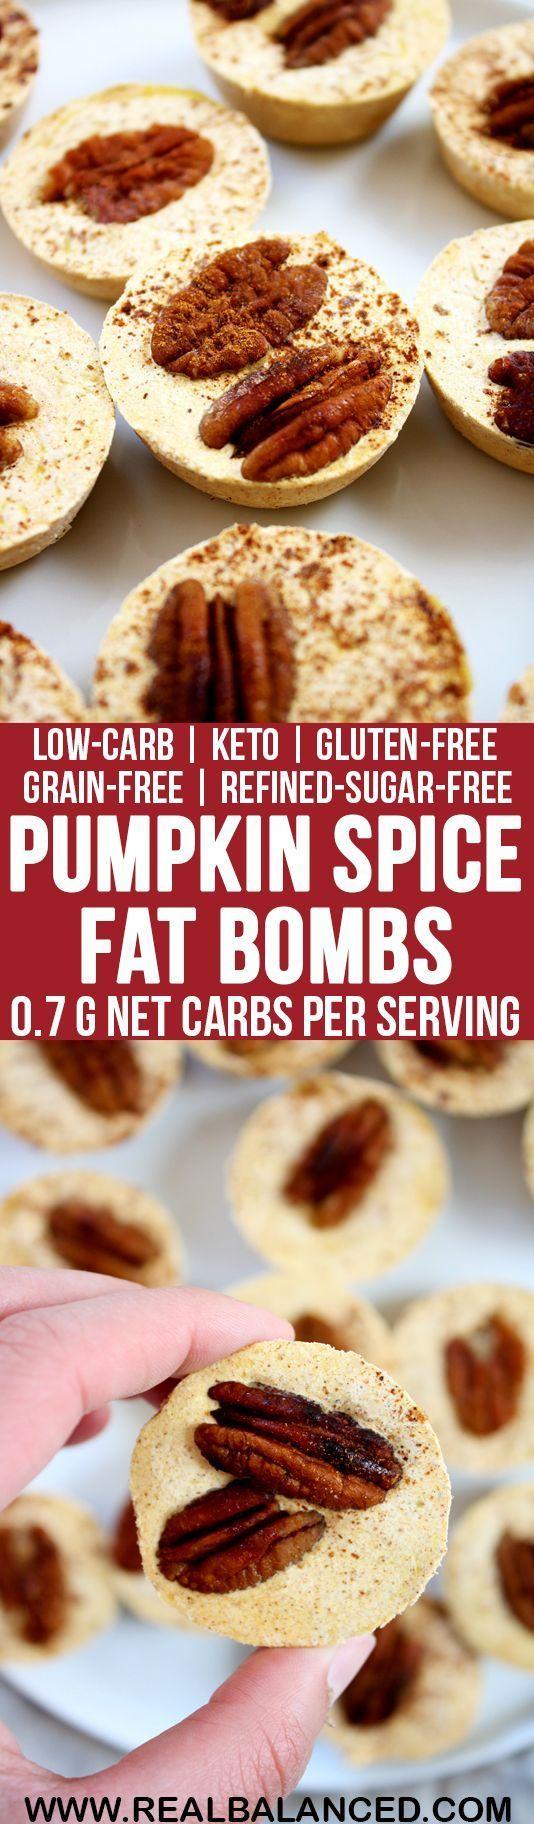 Pumpkin Spice Fat Bombs: low-carb, keto, gluten-free, grain-free, vegetarian, & refined-sugar-free! Less than 1g net carbs per serving!